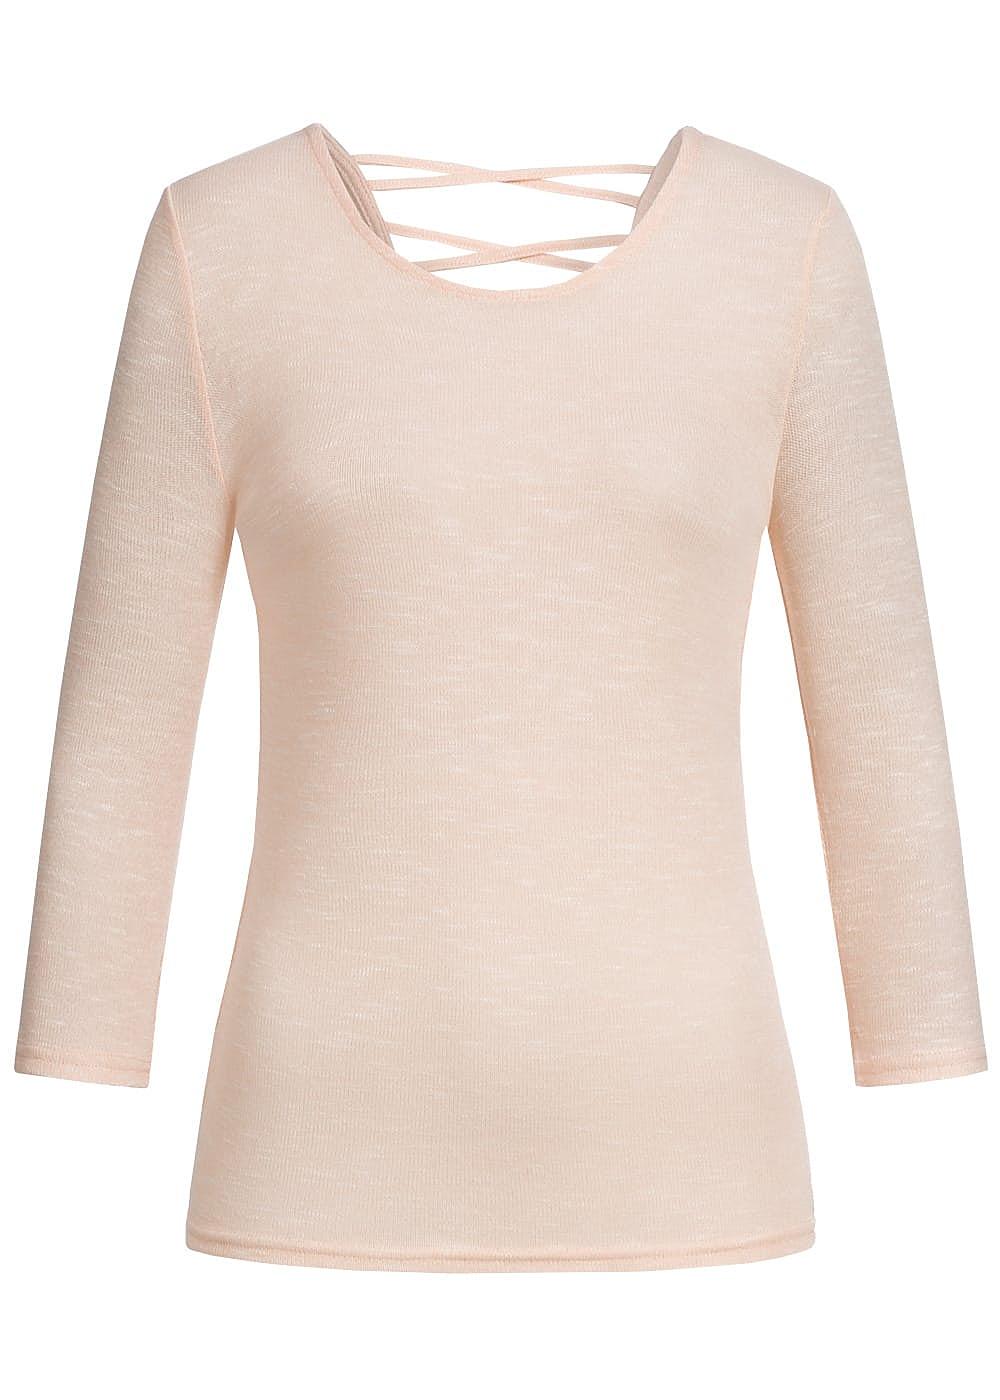 hailys damen shirt 3 4 rmel r ckenausschnitt mit schn rung rosa 77onlineshop. Black Bedroom Furniture Sets. Home Design Ideas